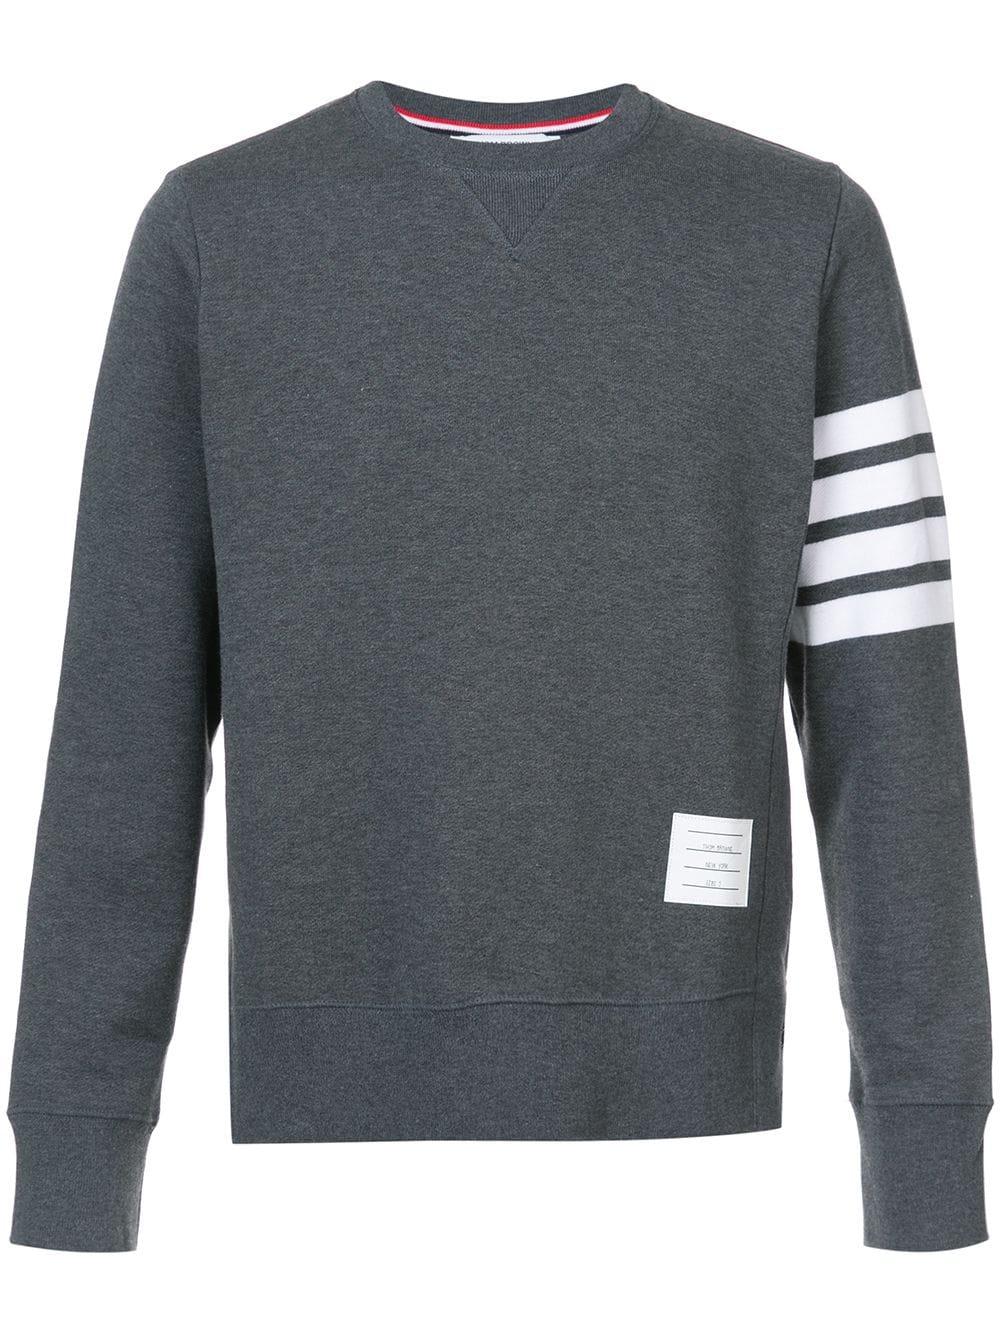 Thom Browne Sweatshirt mit gestreiftem Ärmel - Grau